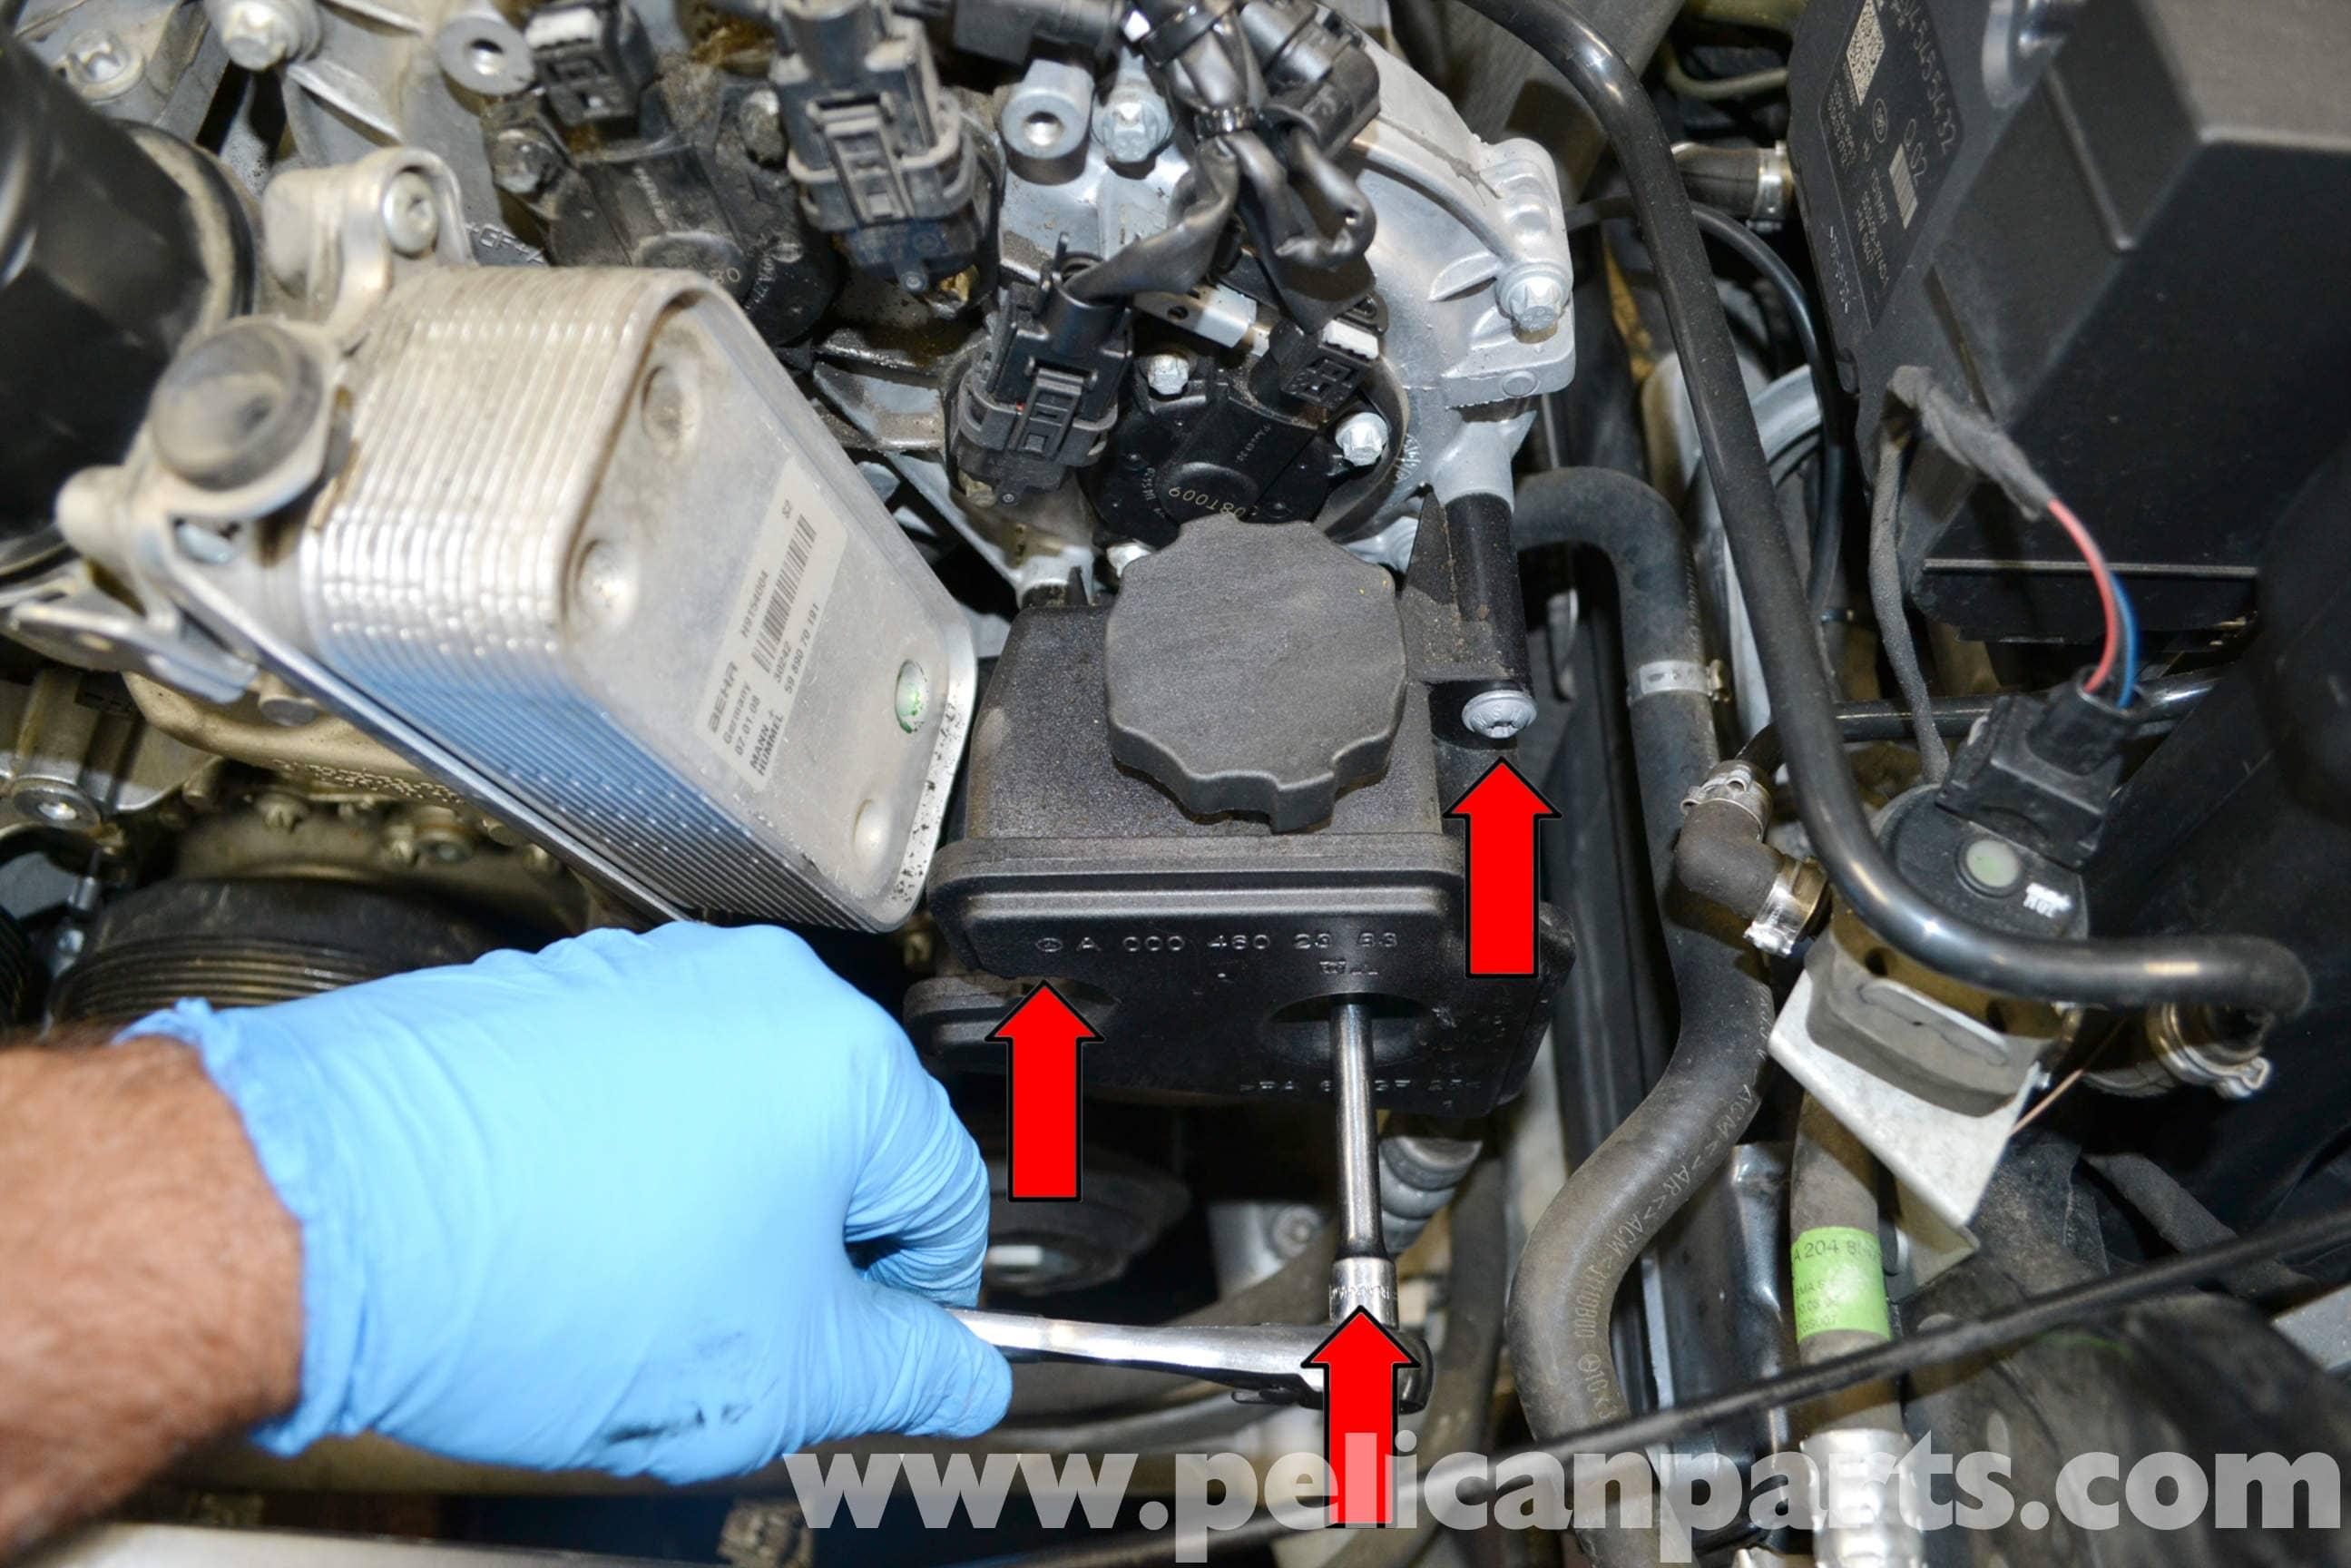 Mercedes Benz W204 Power Steering Reservoir Replacement